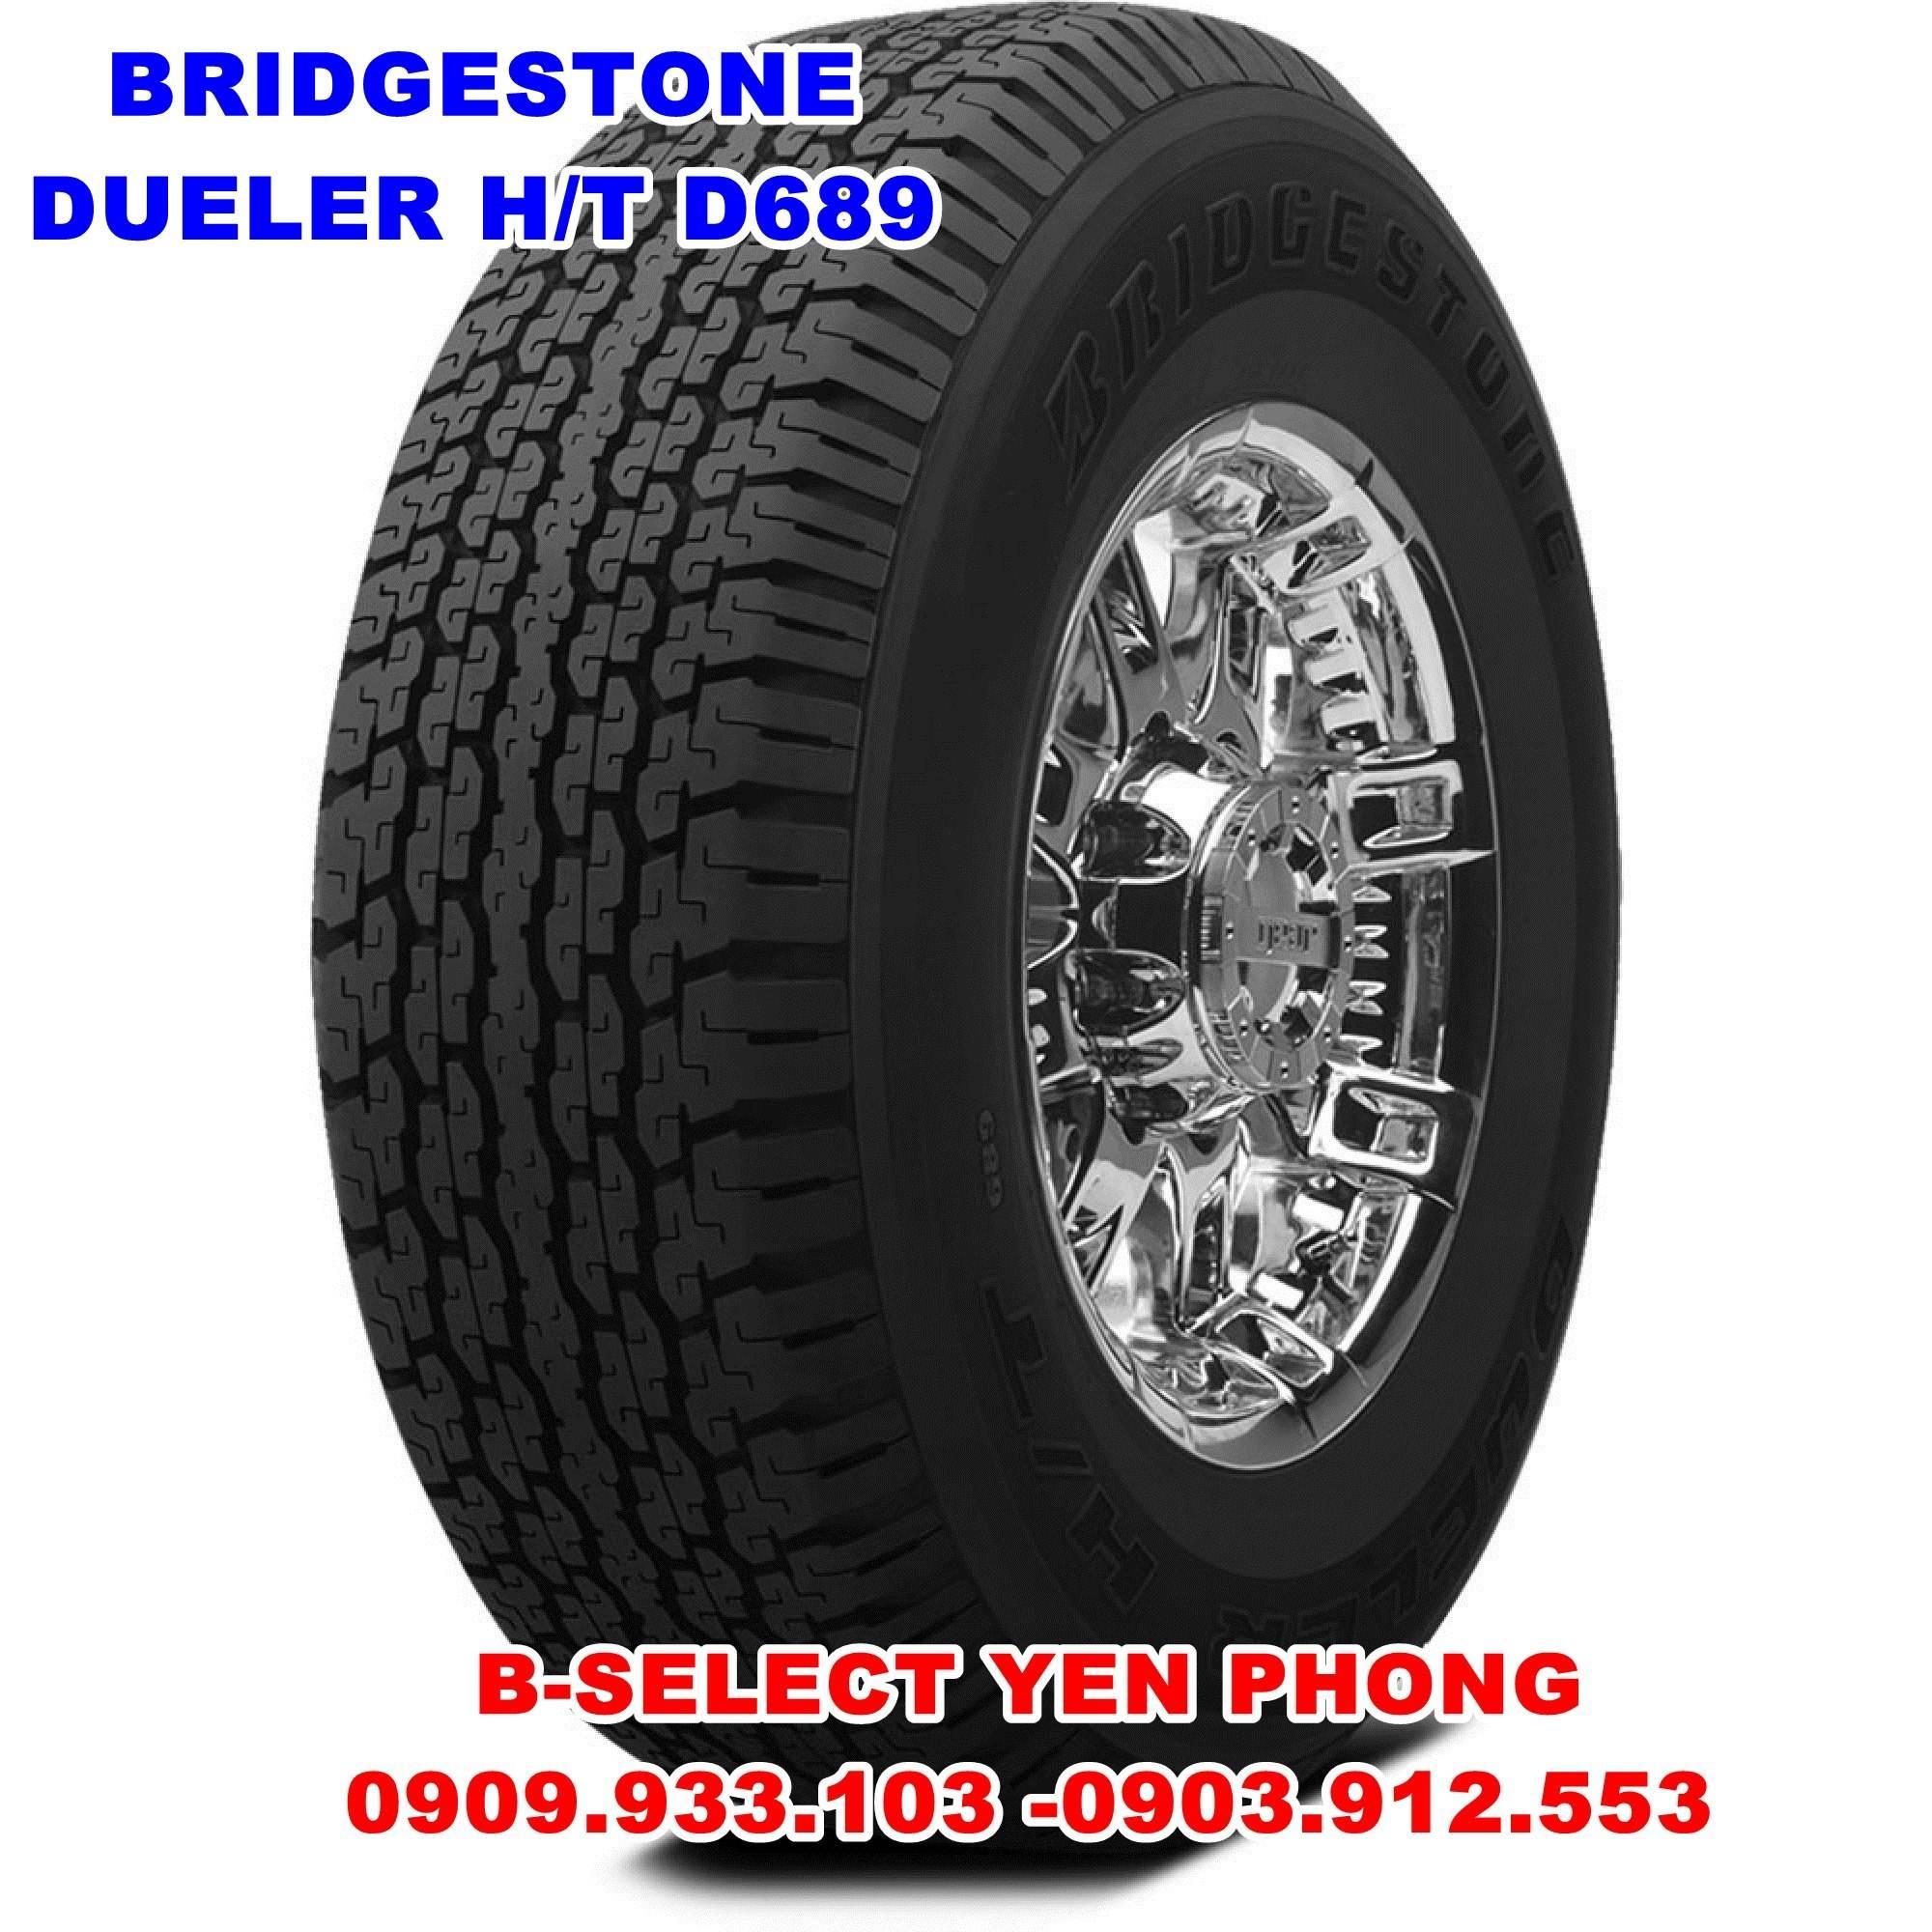 Lốp Xe Du Lịch Bridgestone Dueler 215/80R16 D689